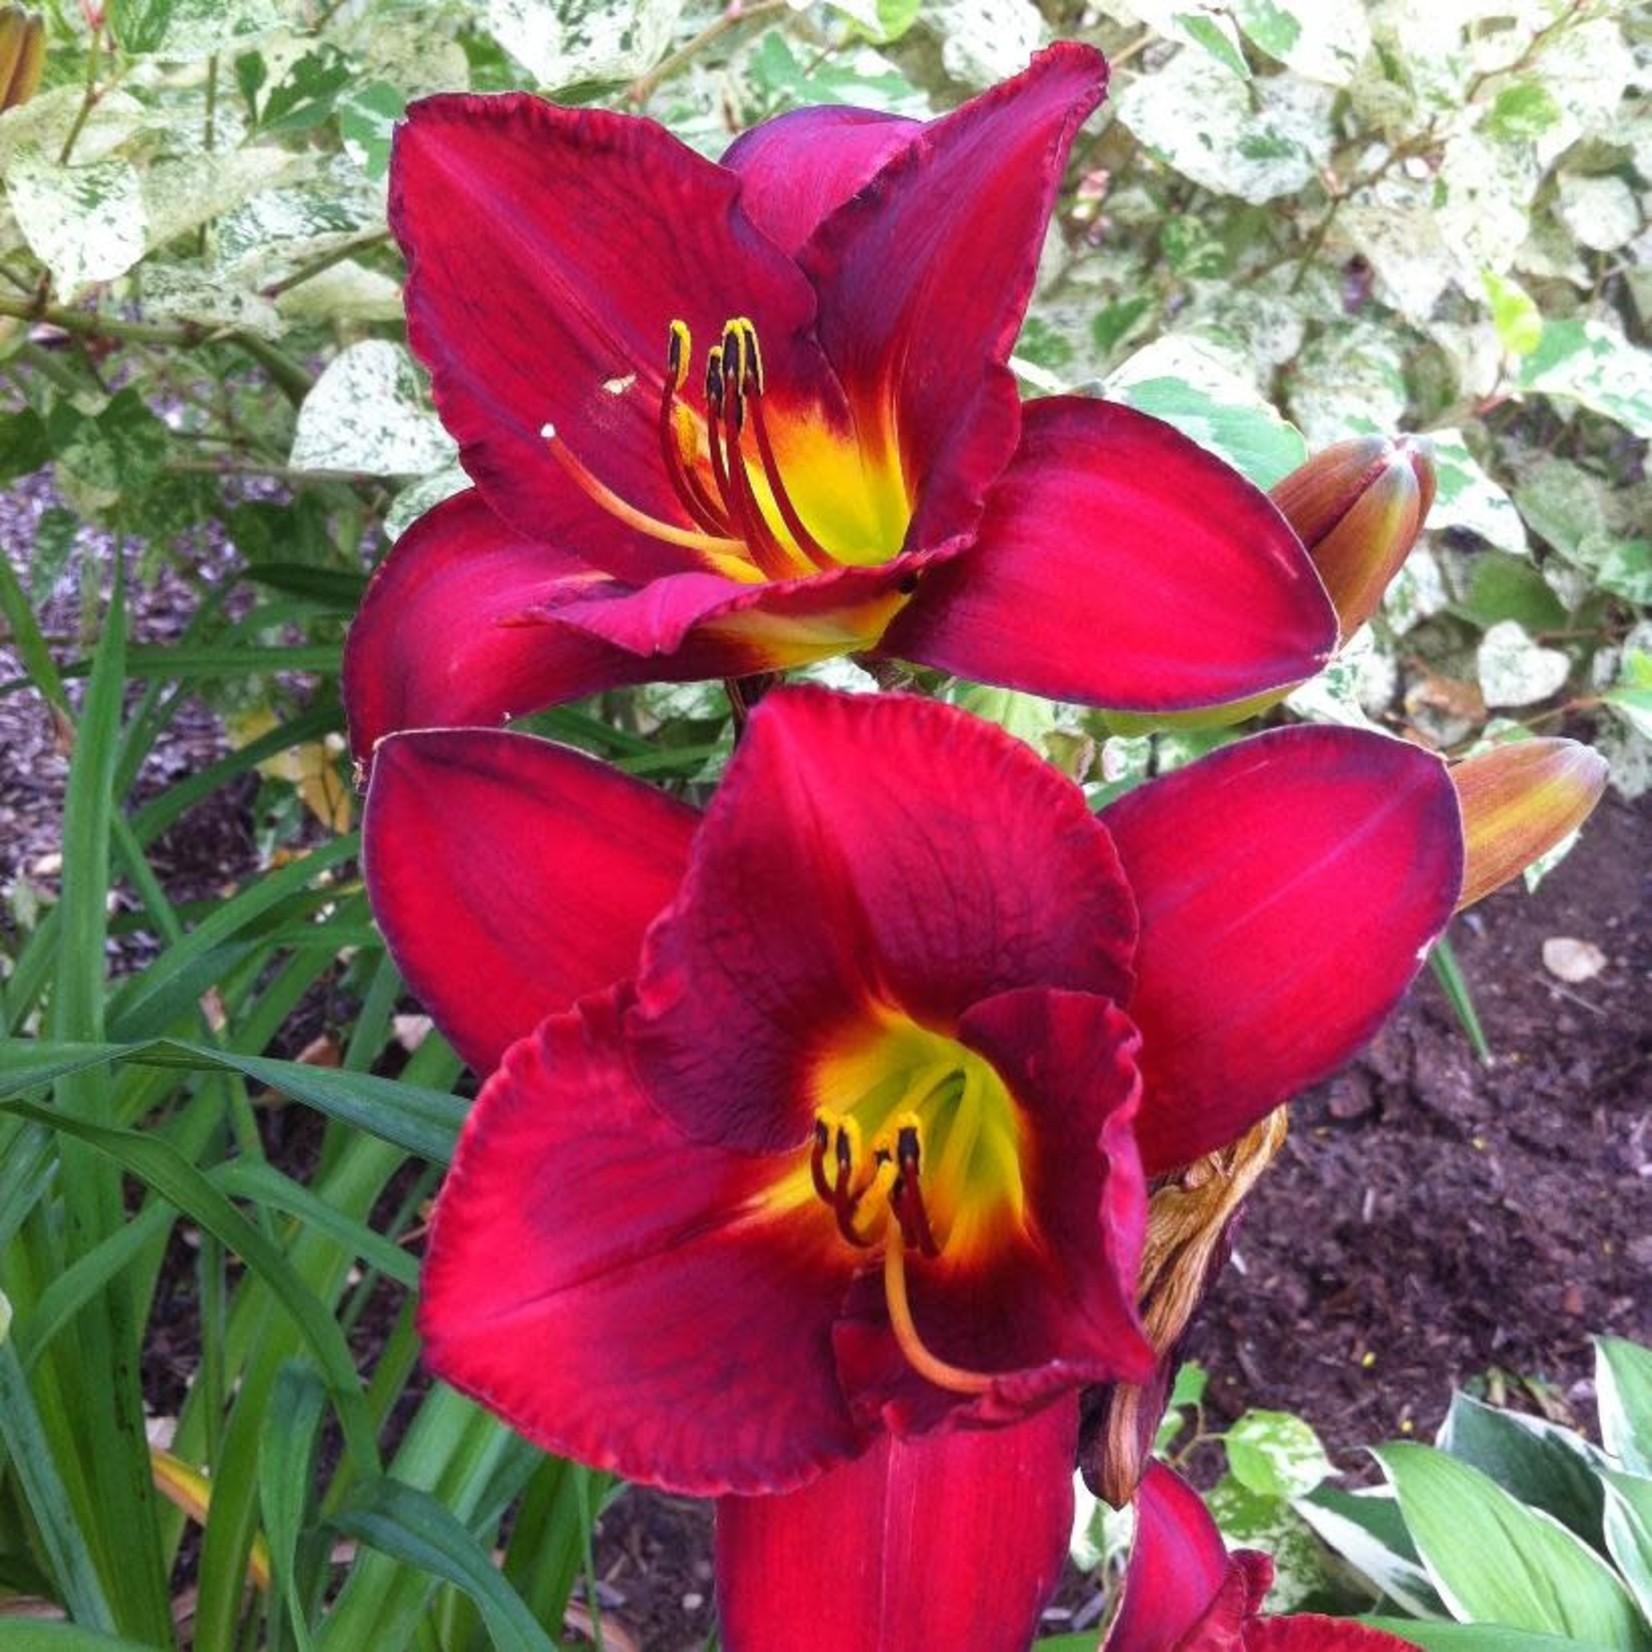 Daylily - Hemerocallis 'James Marsh' - 1 gal